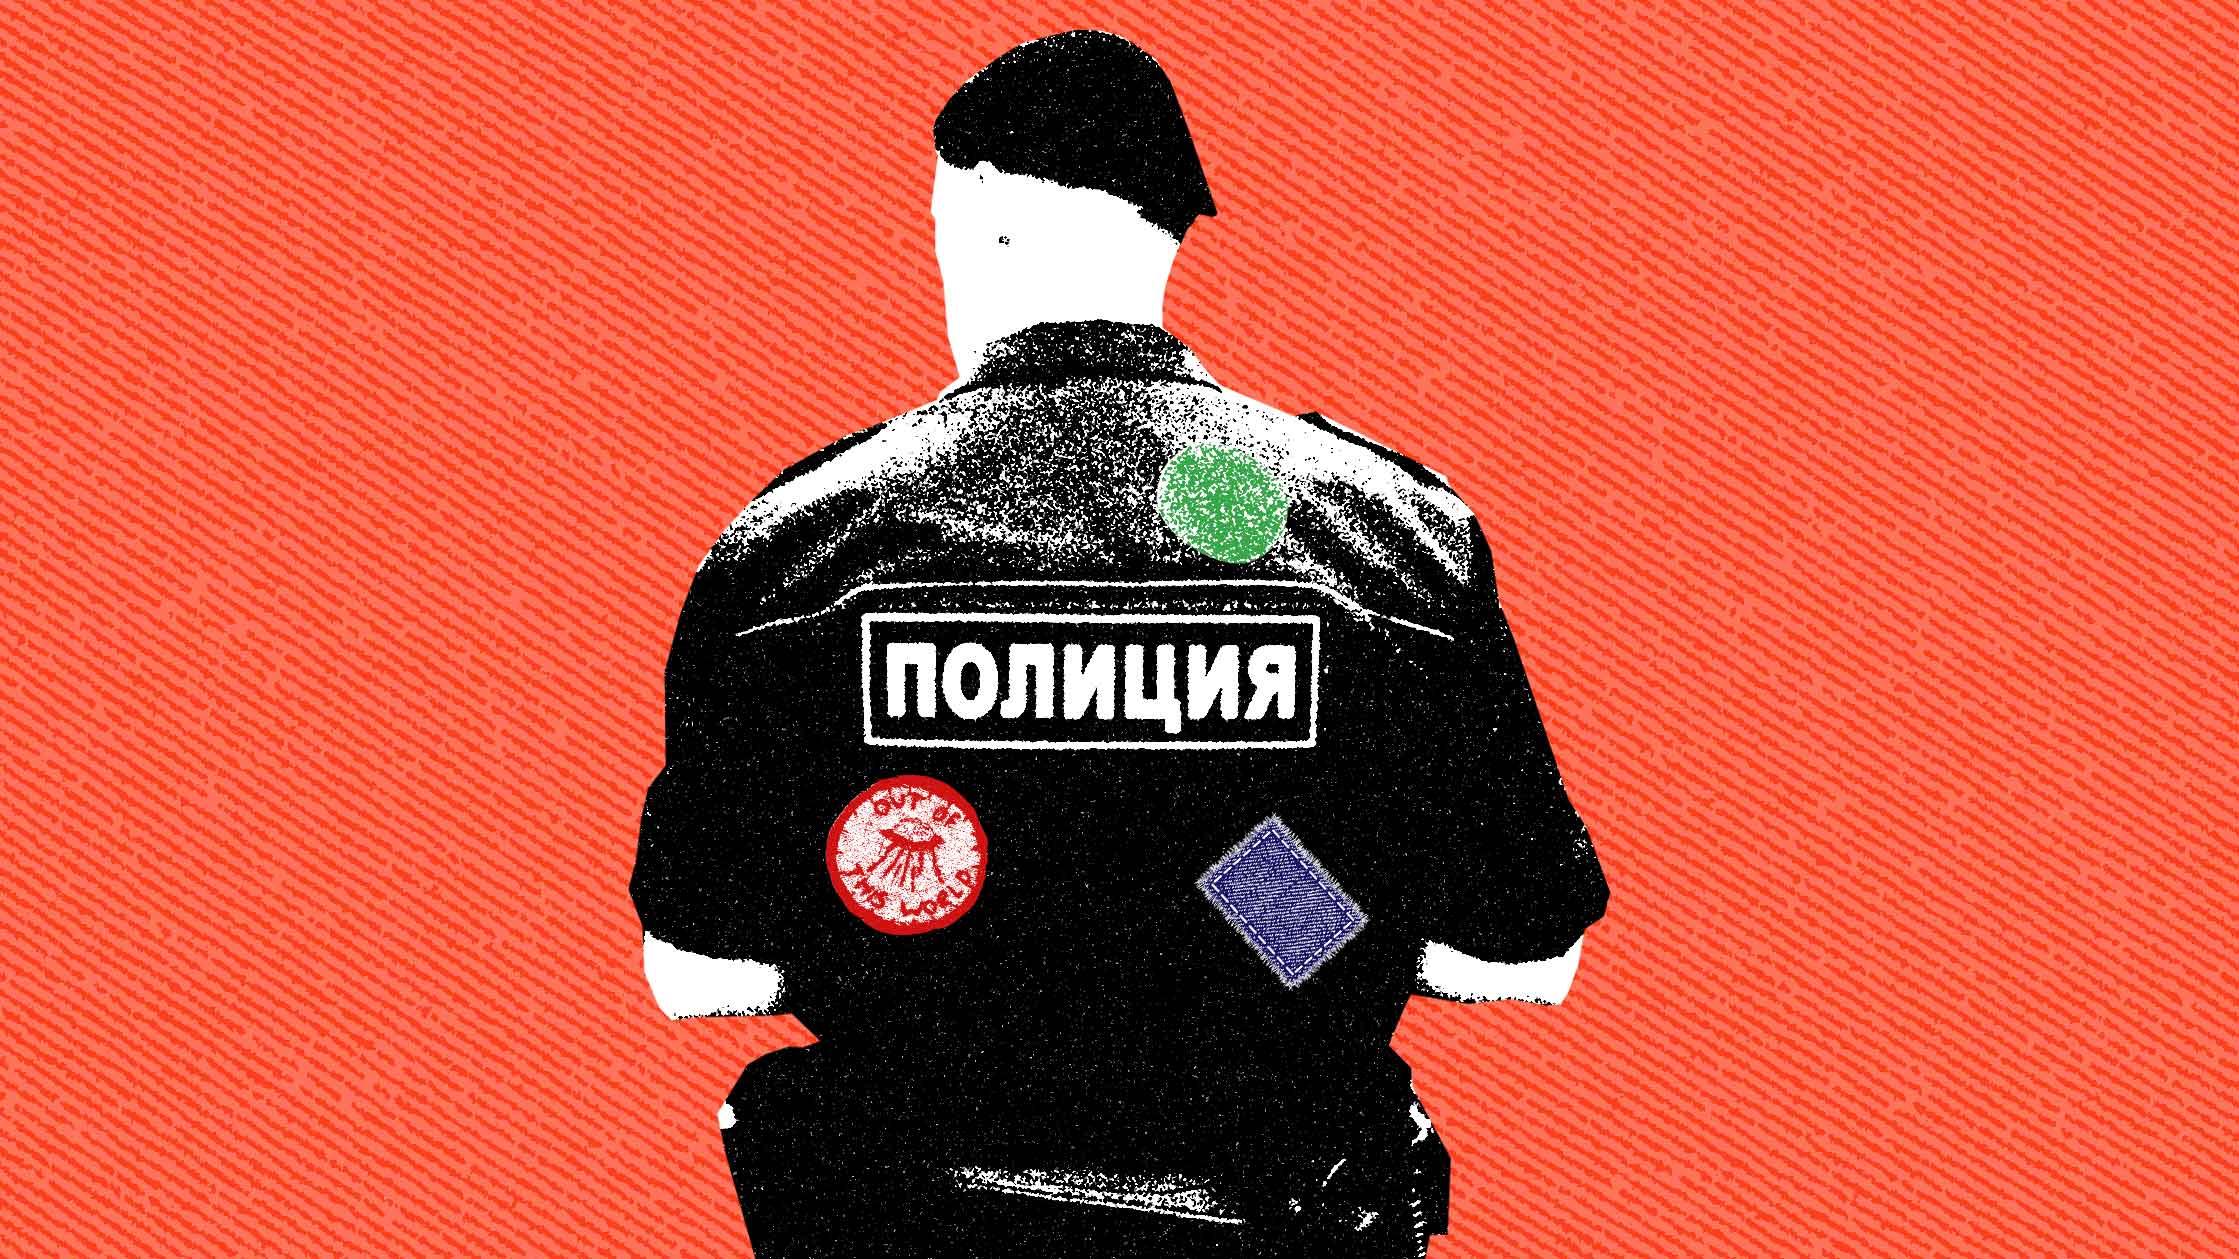 Минфин предлагает 10-процентное сокращение МВД и слияние с ФСИН и приставами